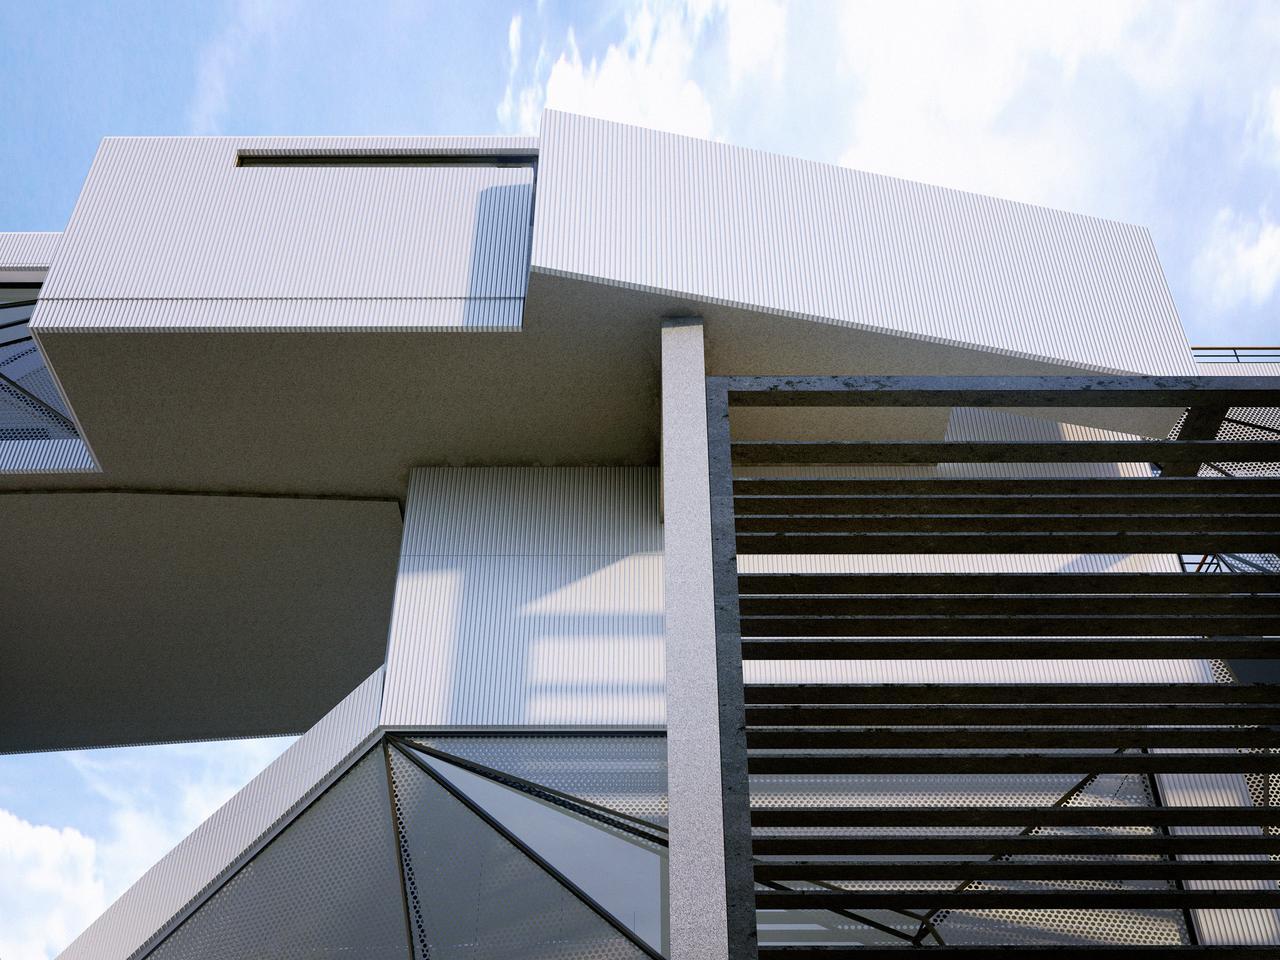 Villa for an Aviator, by Urban Office Architecture (Photo: Urban Office Architecture)